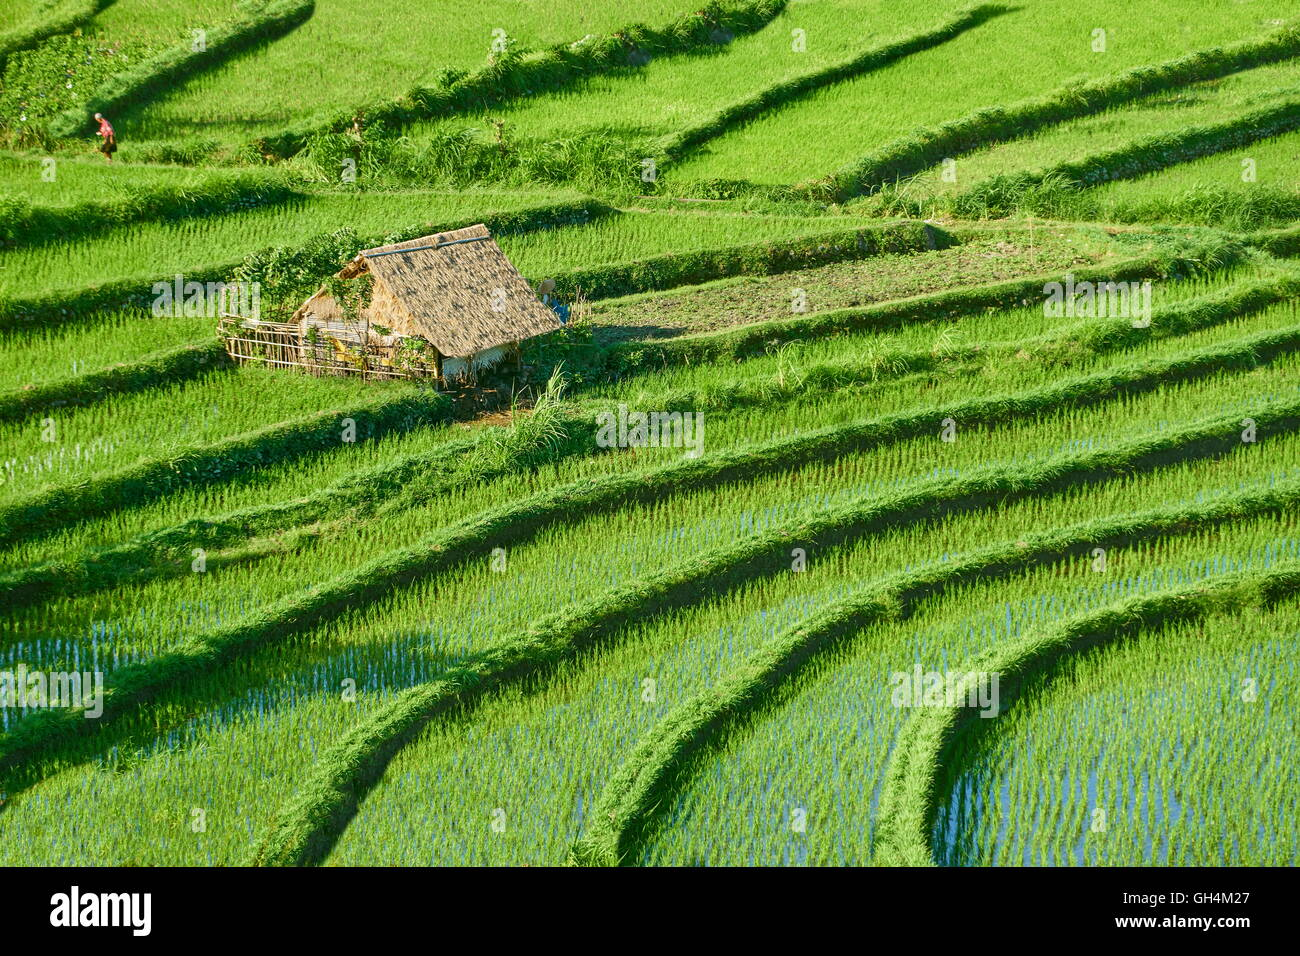 Campo de terrazas de arroz, Bali, Indonesia Imagen De Stock